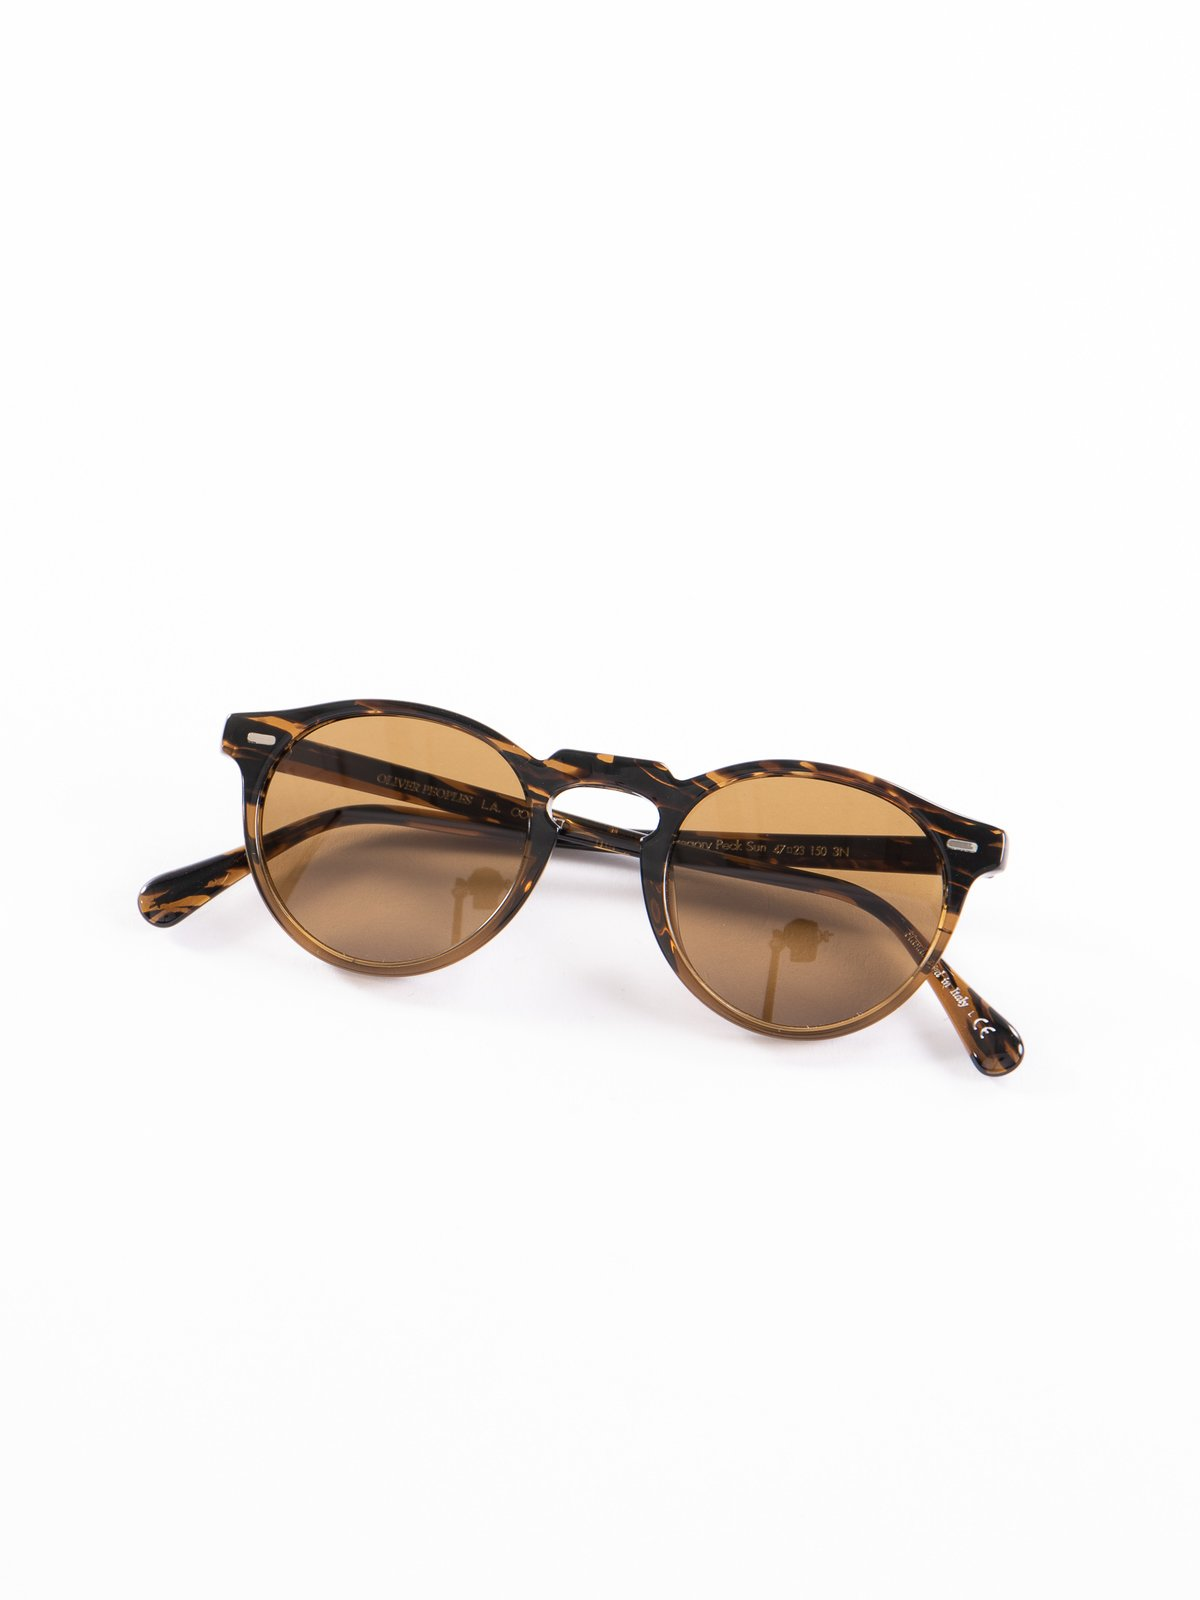 Tortoise/Brown Gregory Peck Sunglasses - Image 1